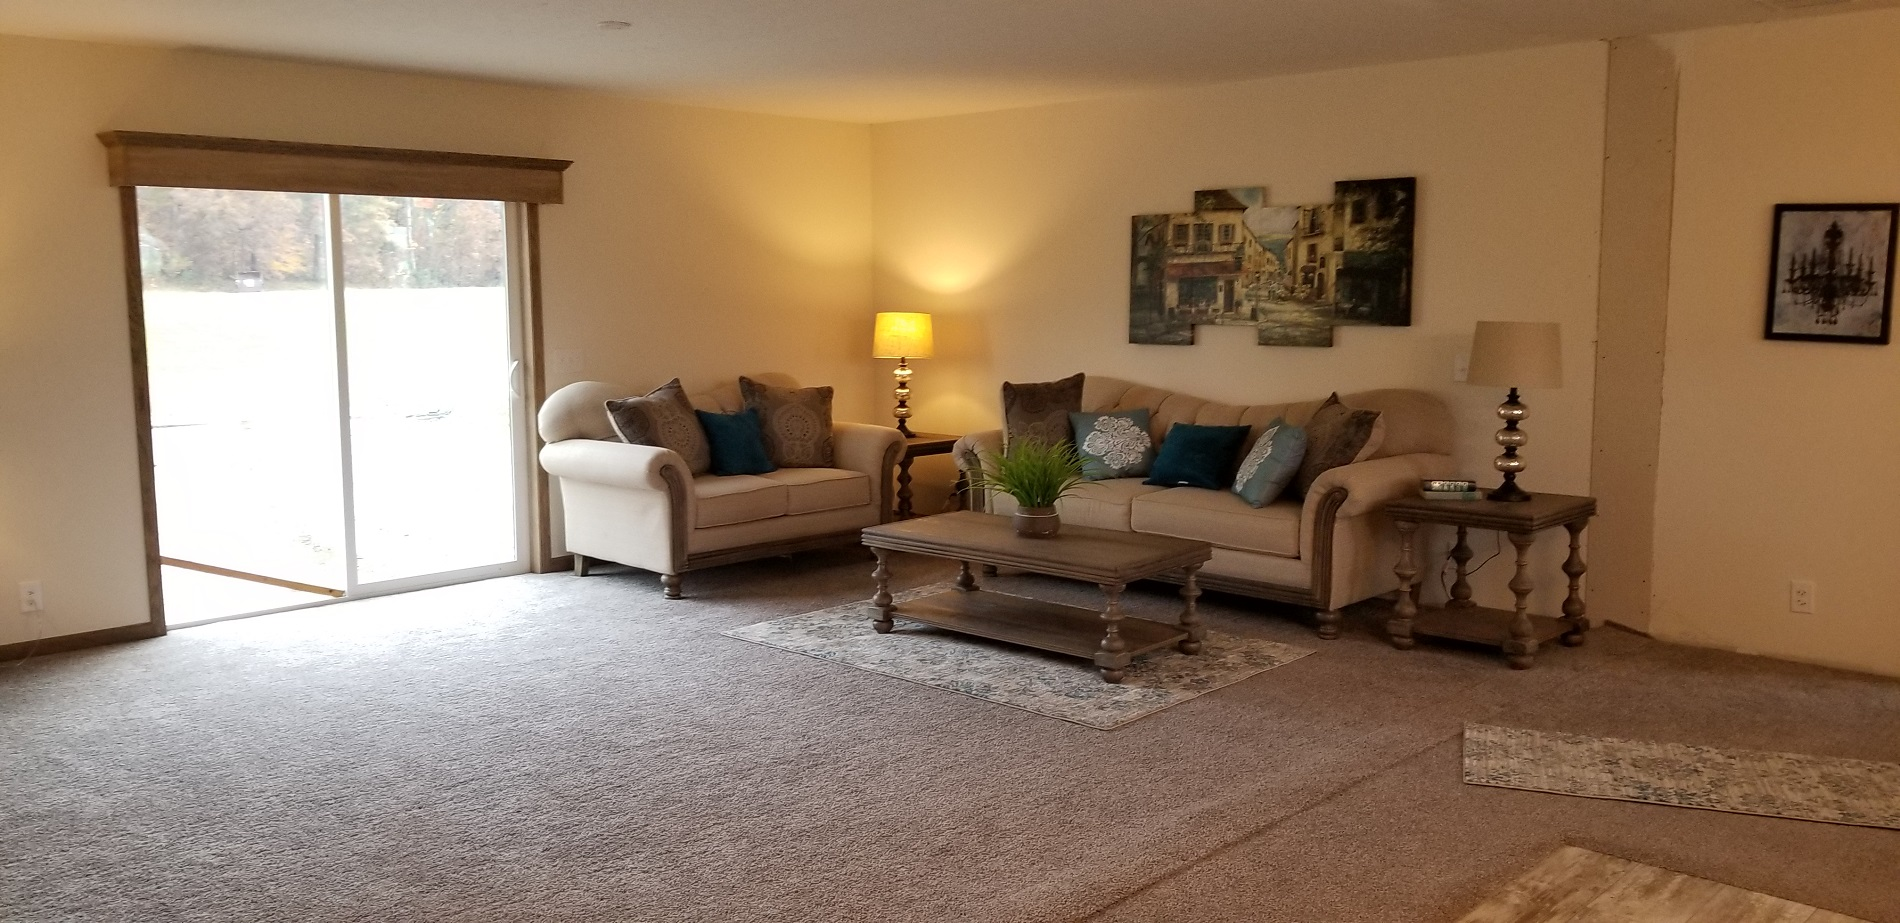 Champion Barton DM6005 Living Room